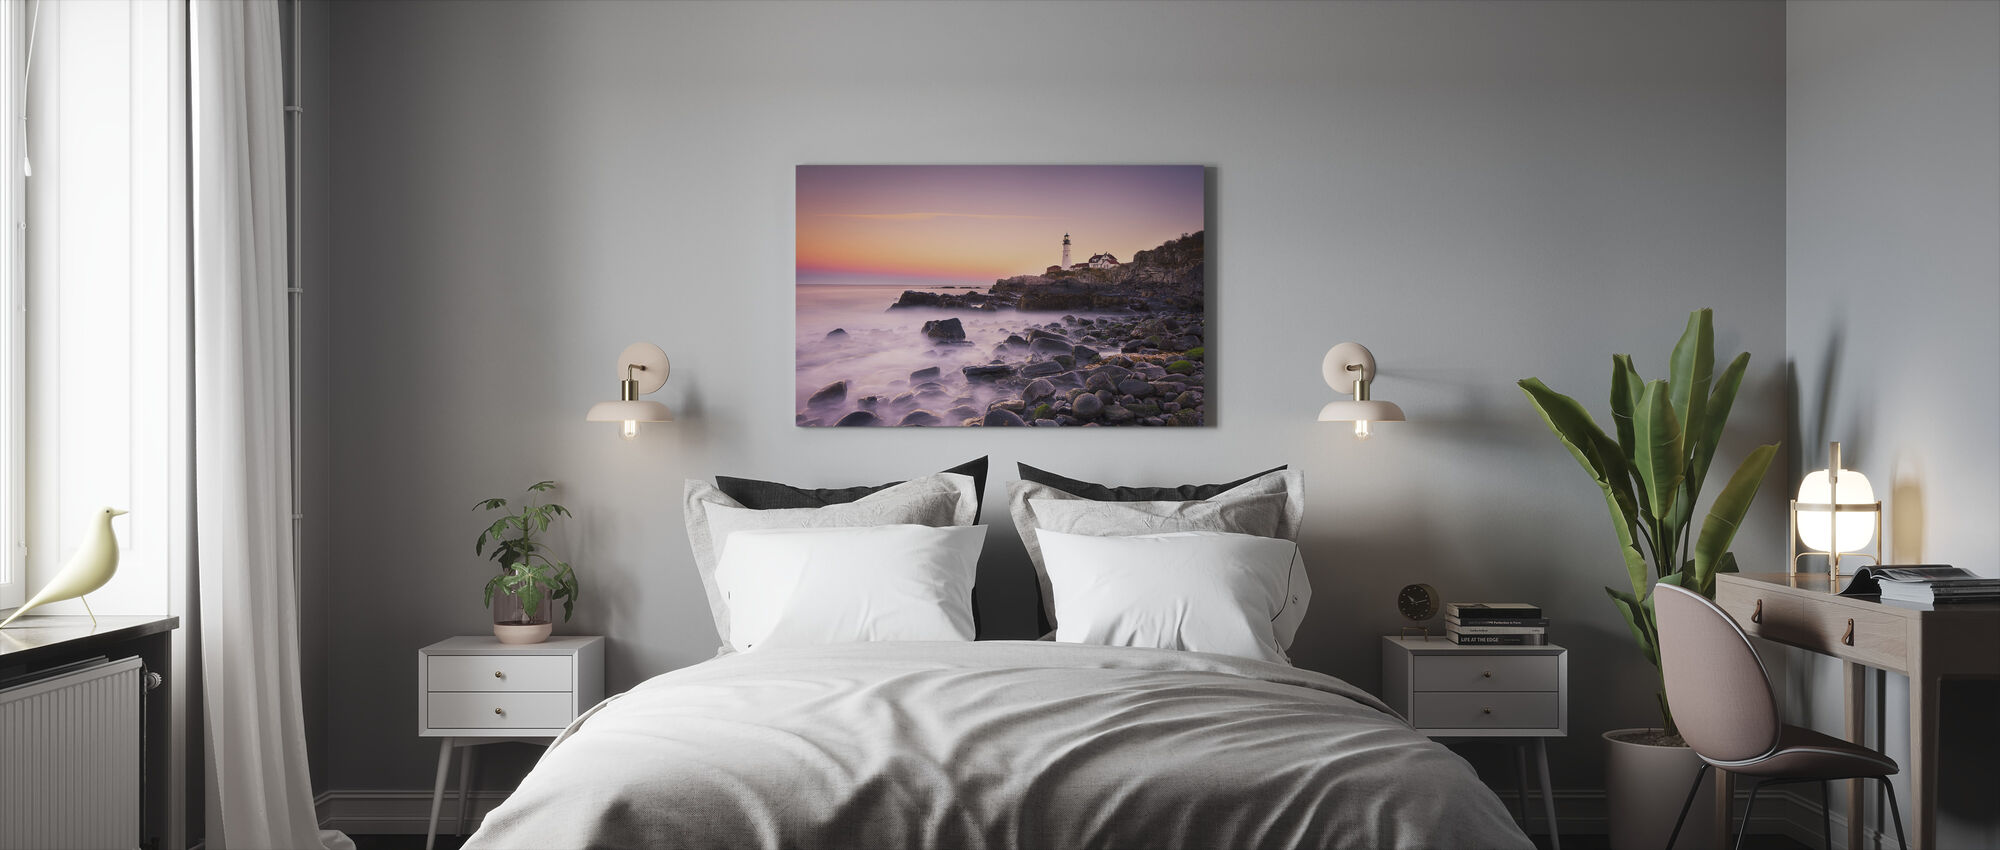 Portland Headlight - Canvas print - Bedroom